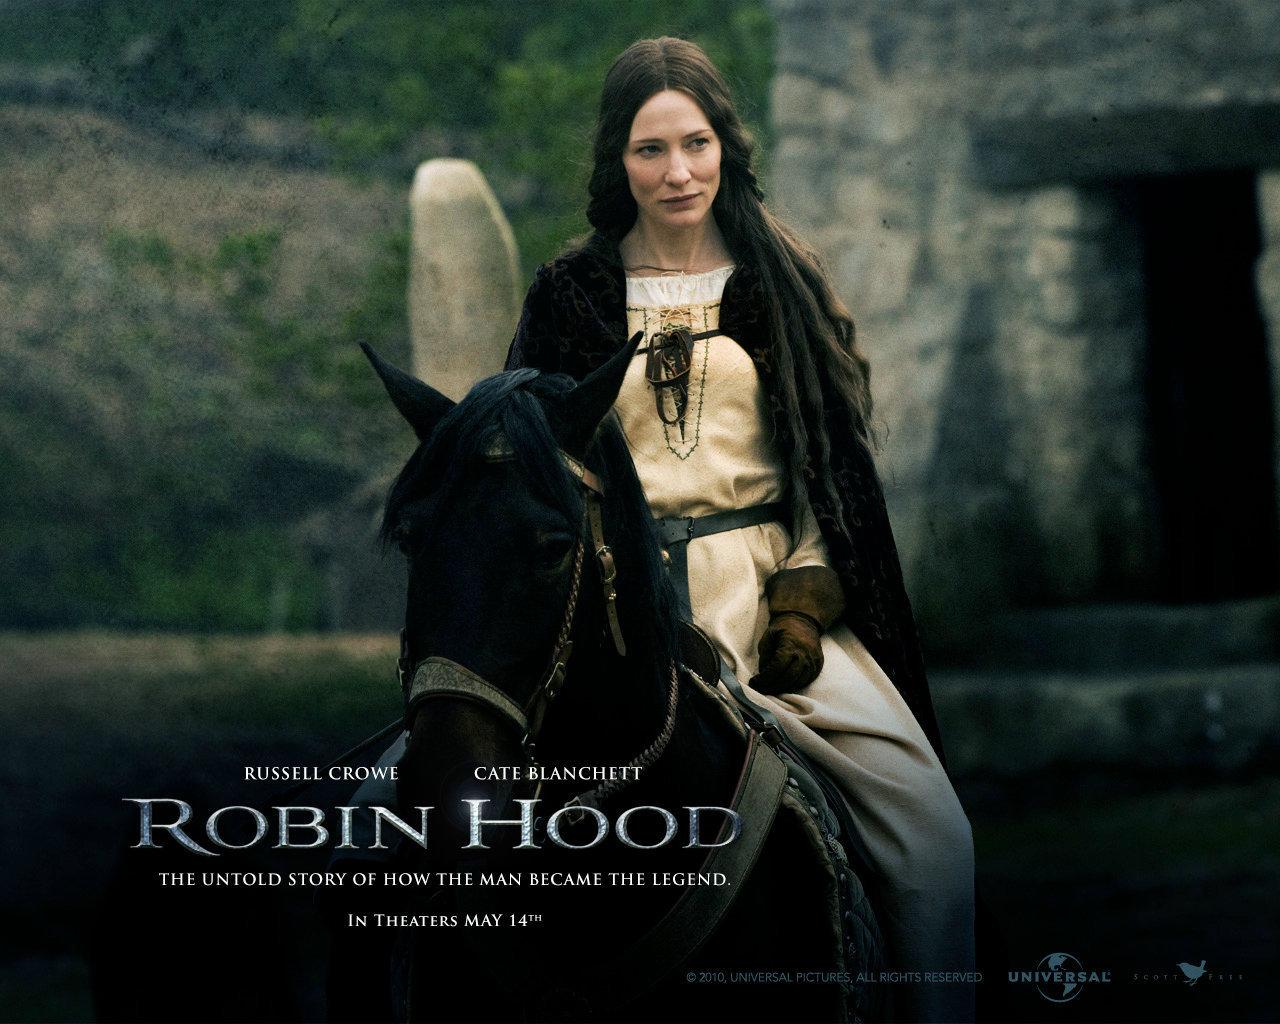 http://3.bp.blogspot.com/_EqchNqfBQtQ/TSmDxKPHbhI/AAAAAAAAAcE/6kBGB1Ofkvw/s1600/Robin+Hood+1.jpg